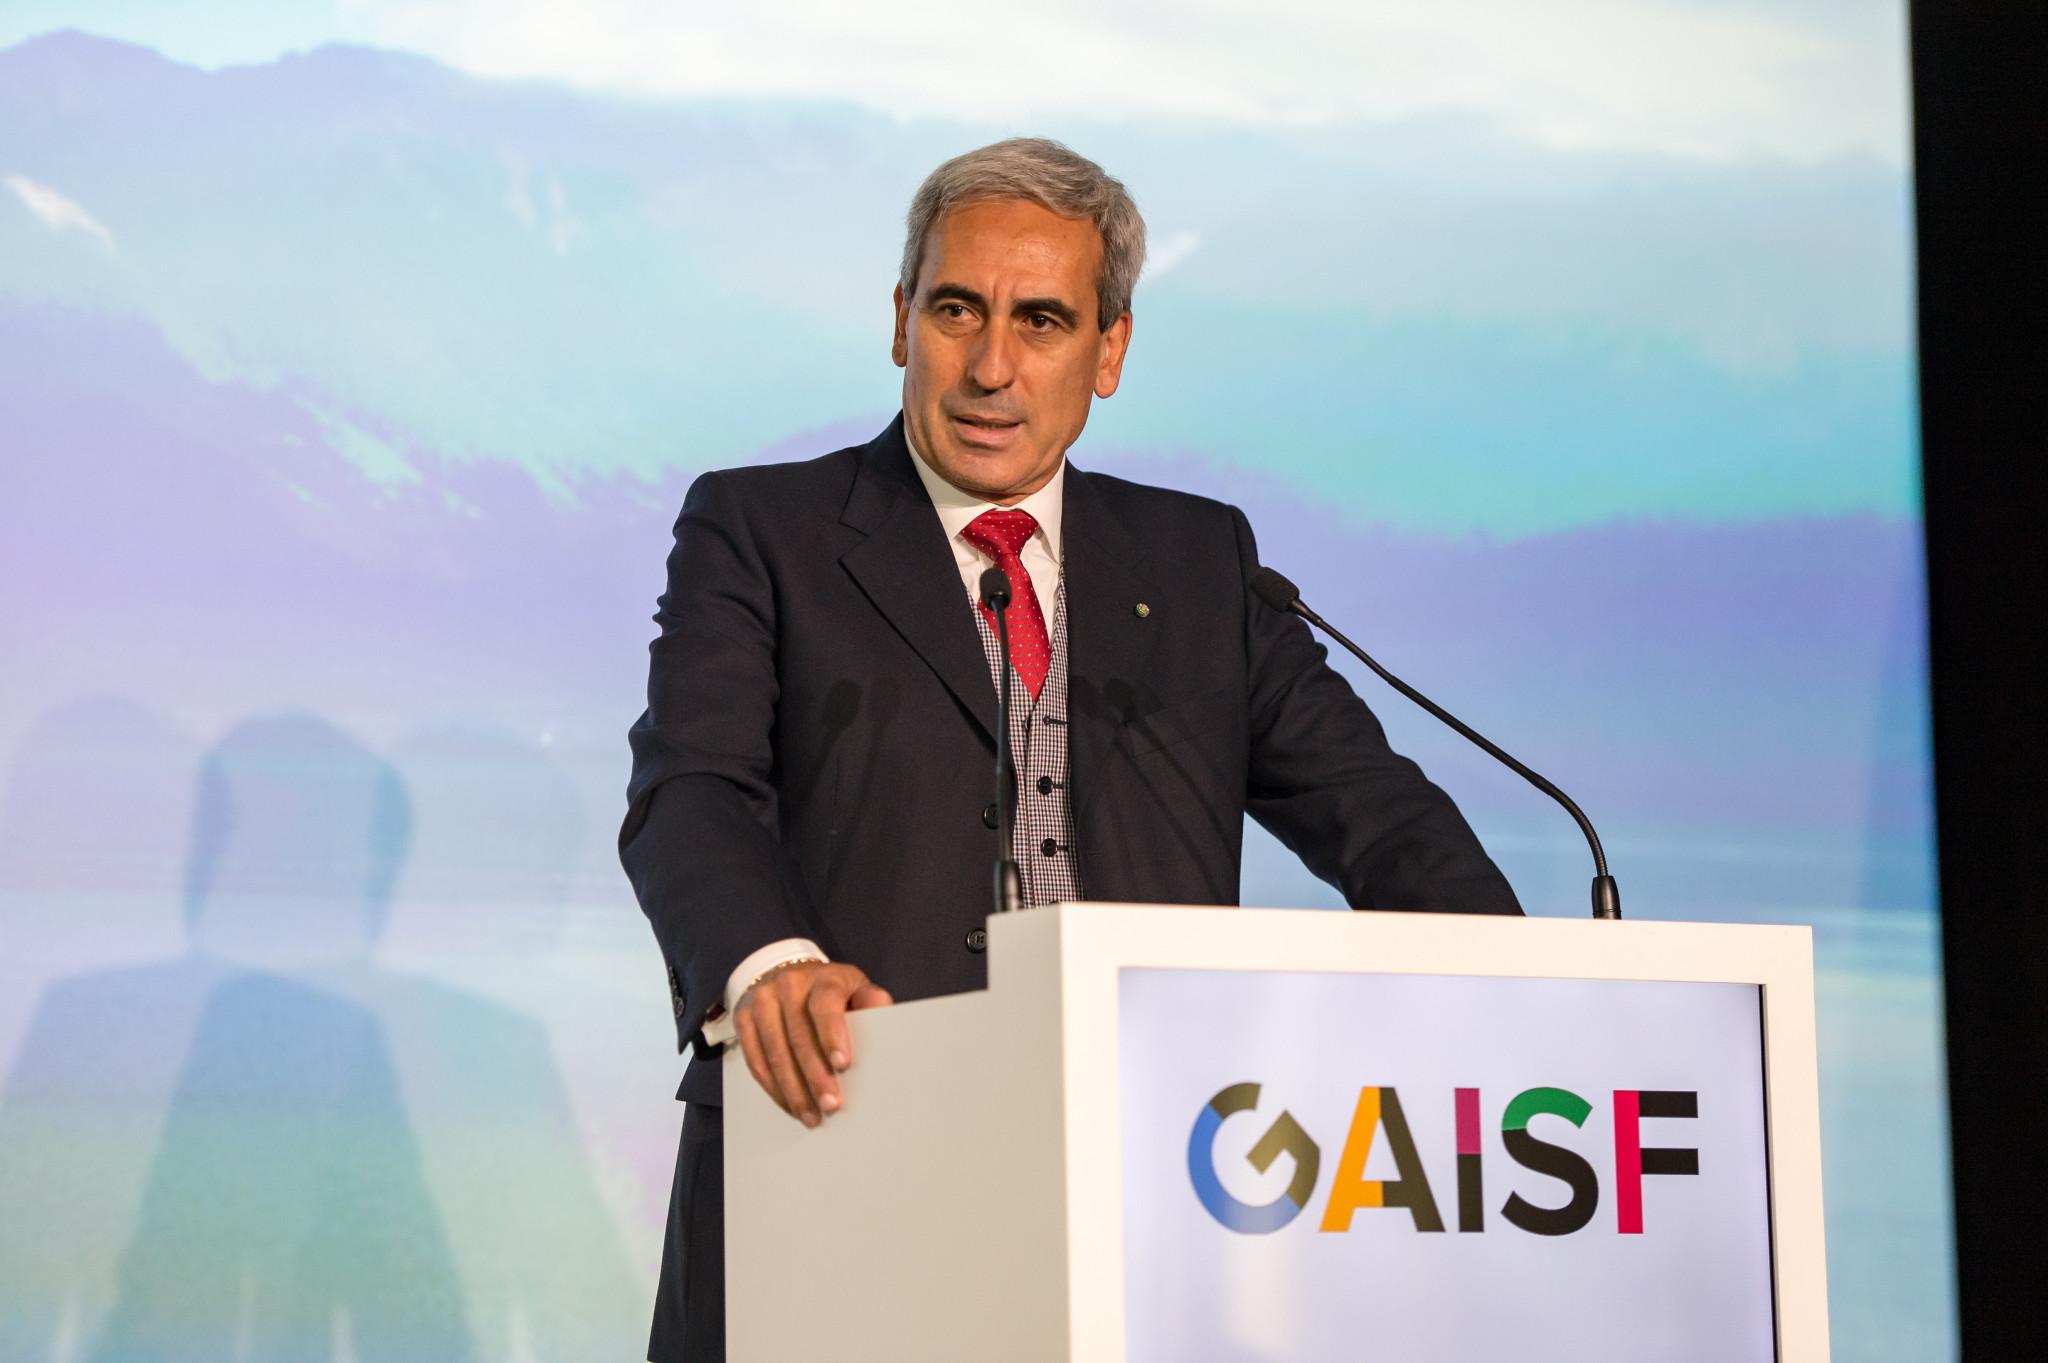 GAISF President Chiulli lauds Tokyo 2020 Olympics hosting